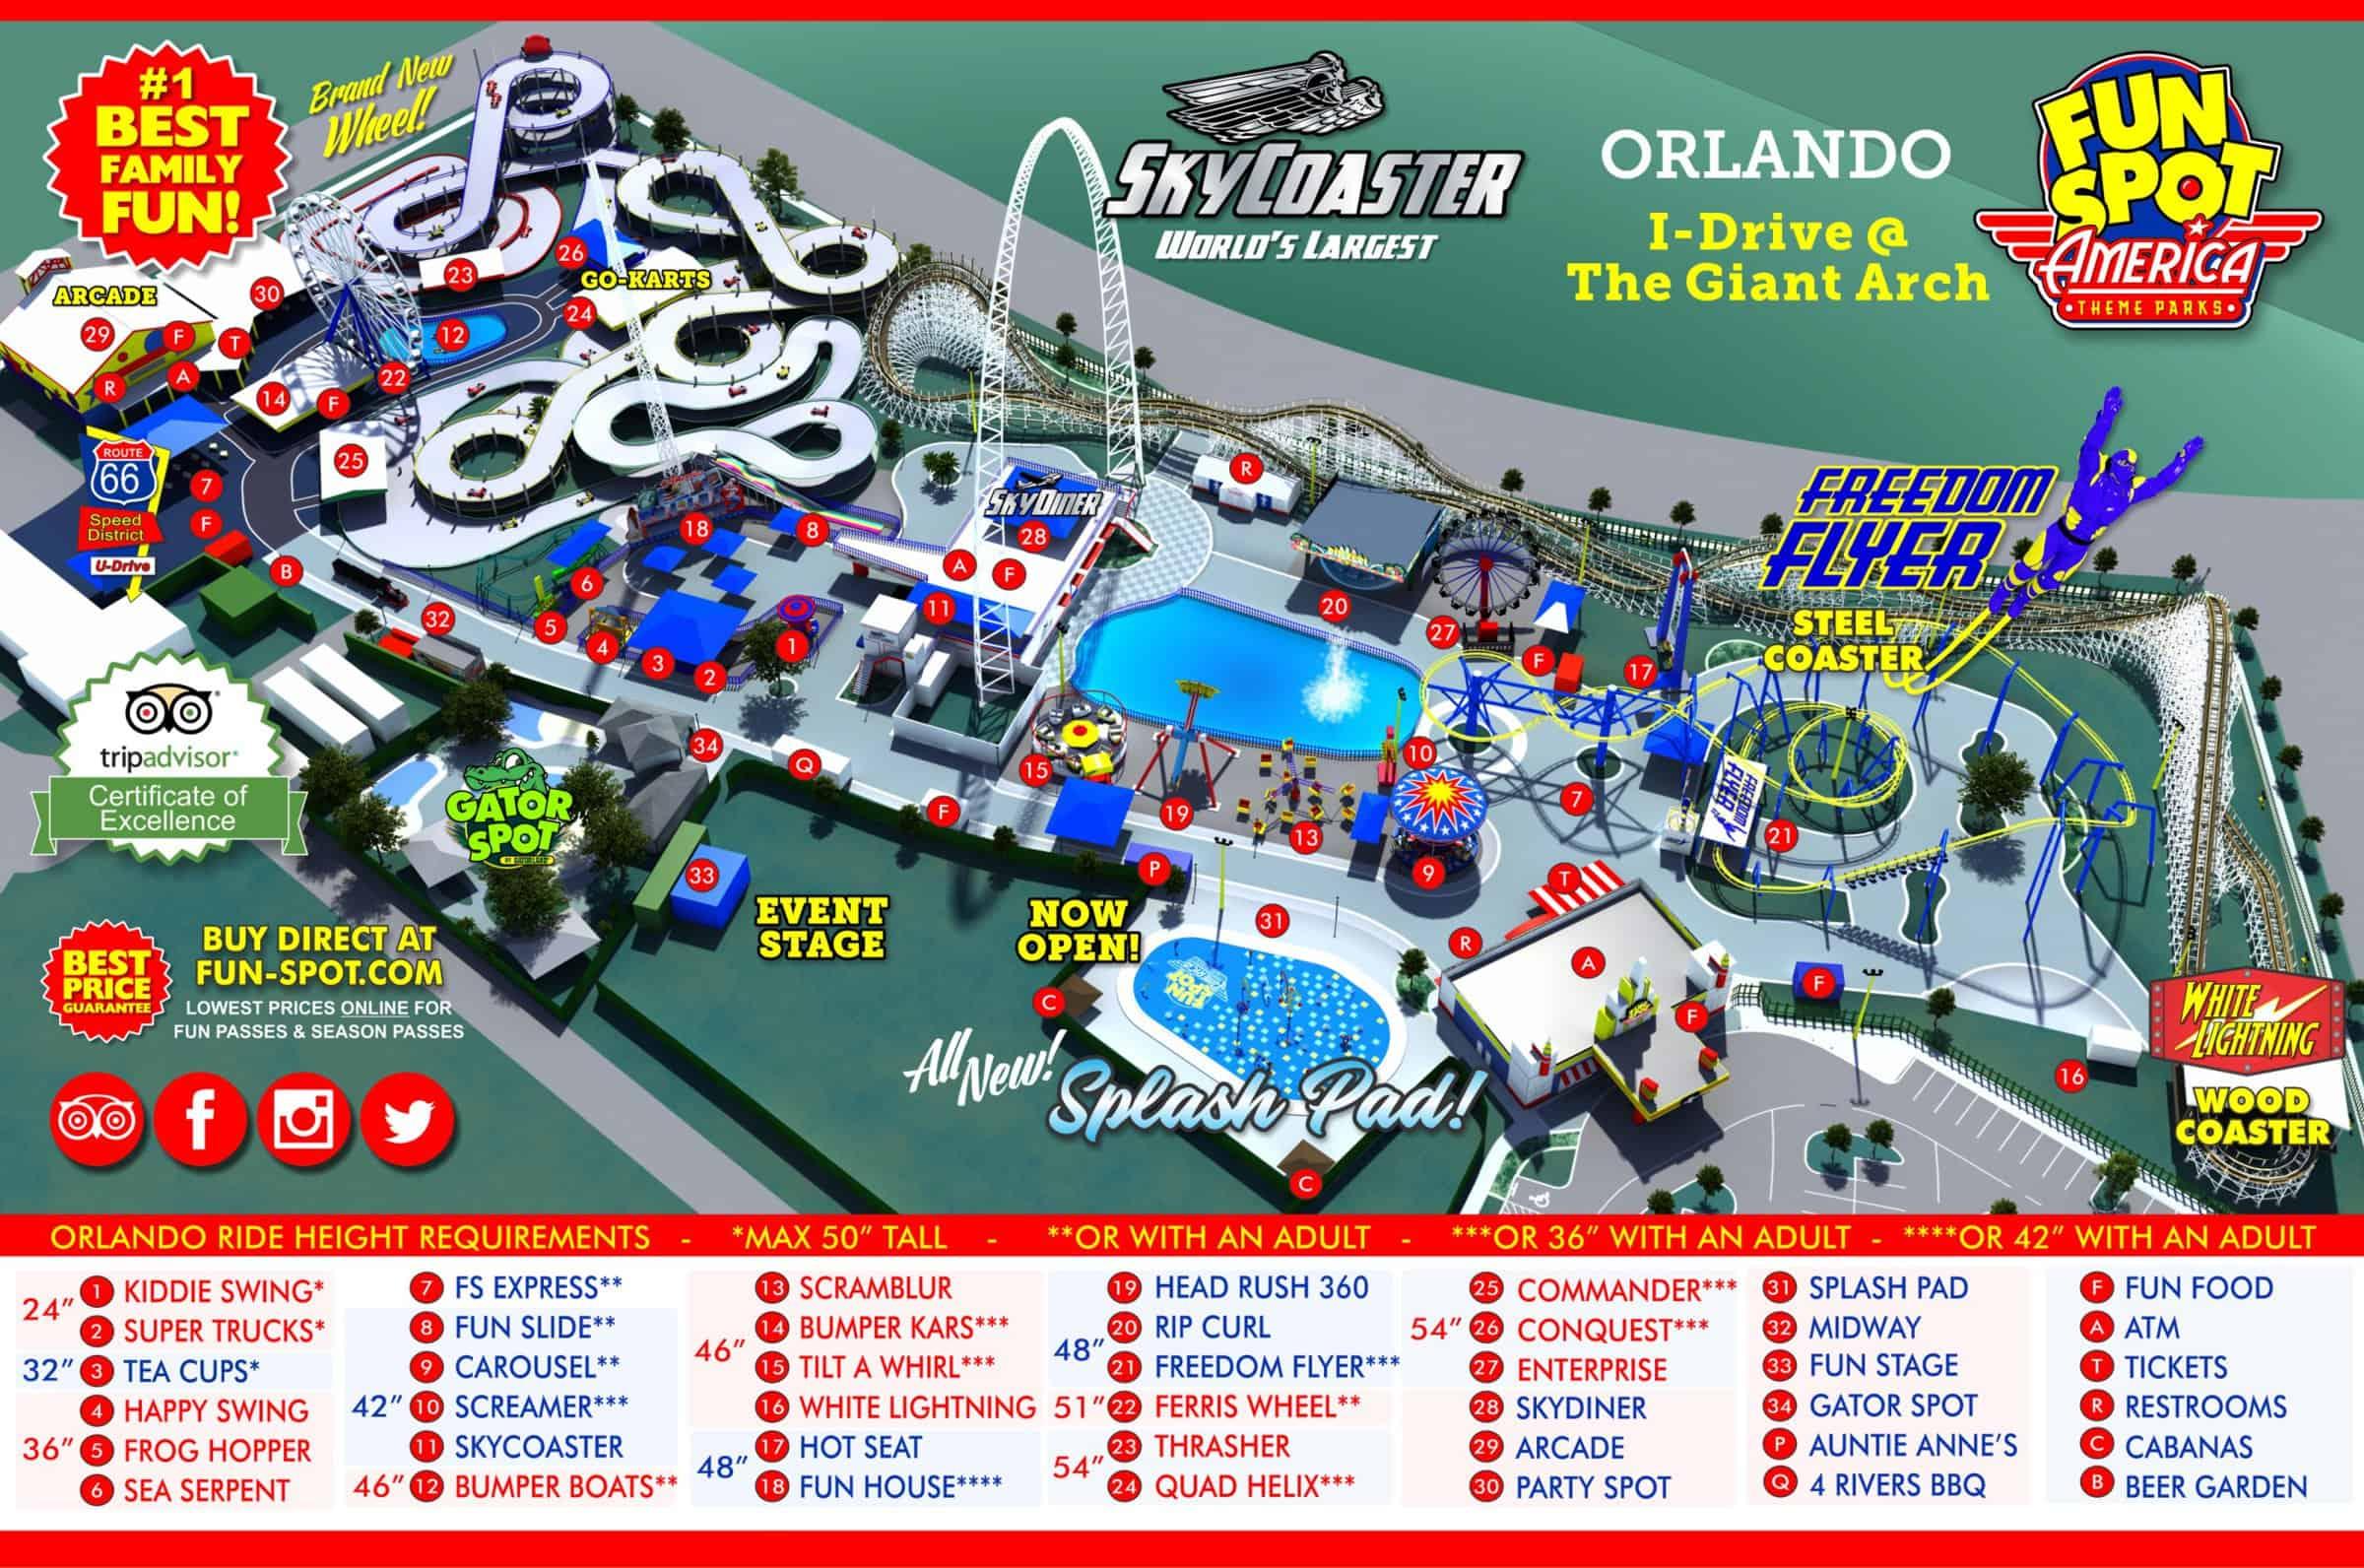 mapa fun spot america international drive